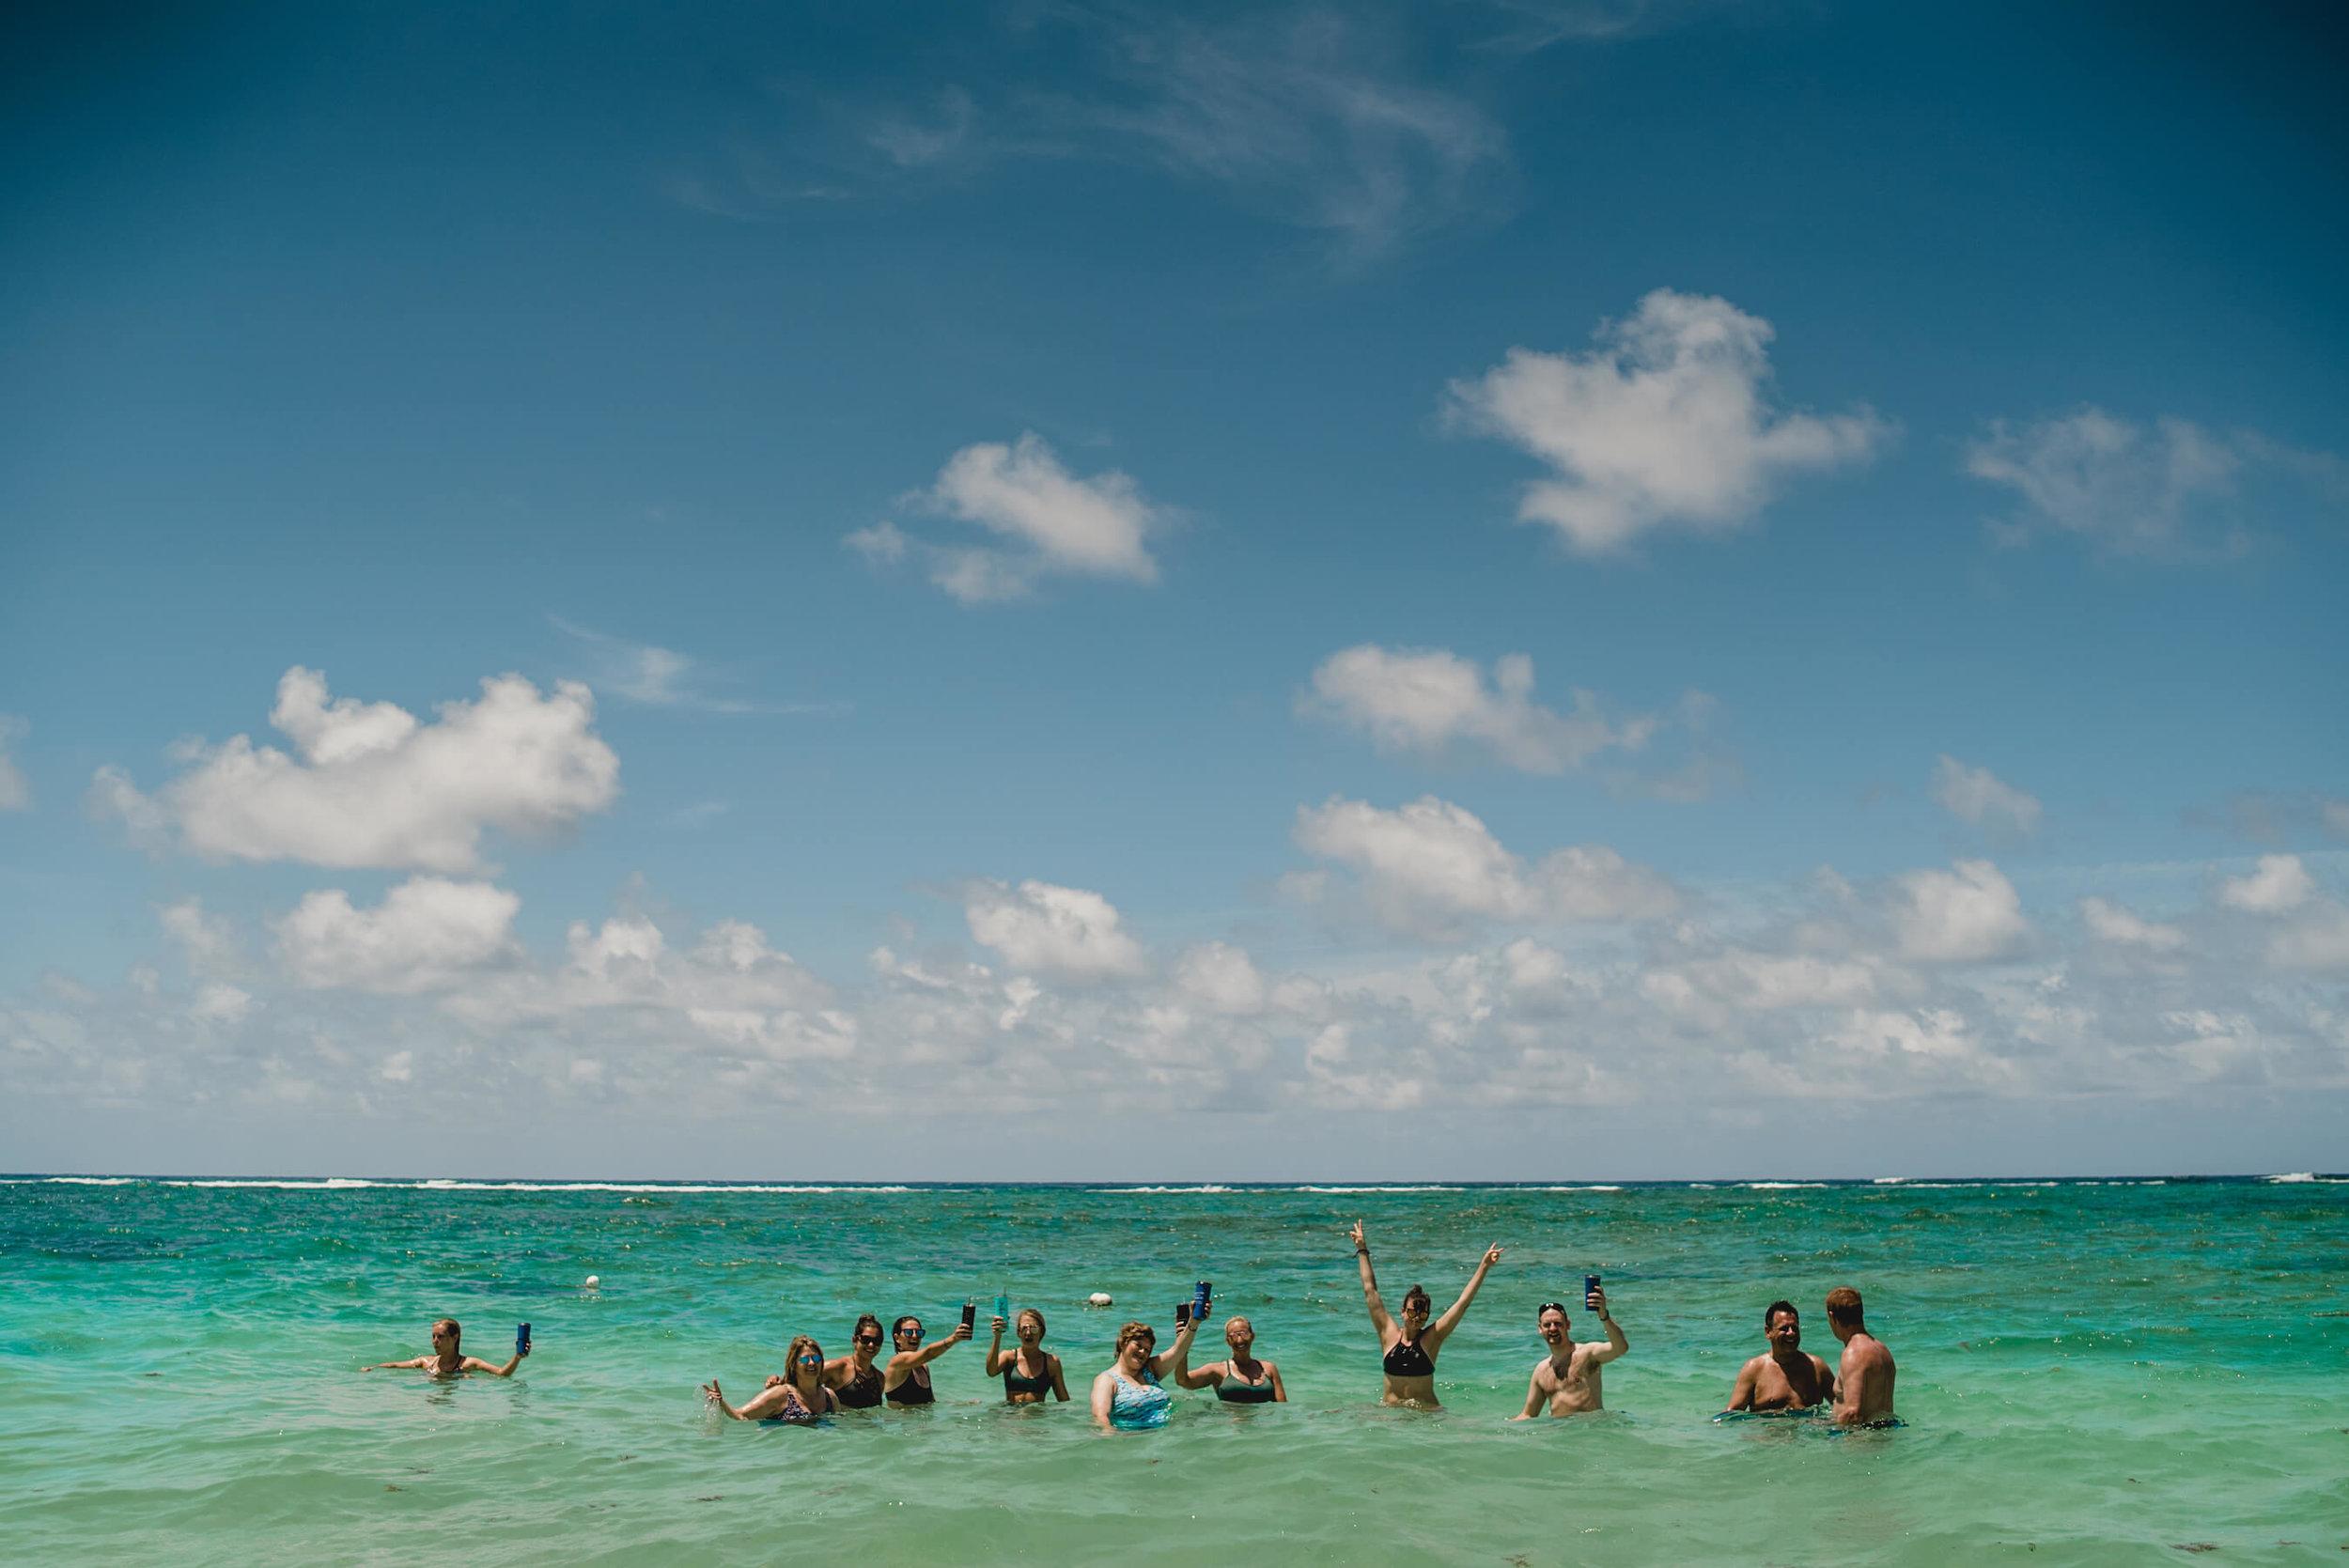 engle-olson-punta-cana-dominican-republic-27.jpg